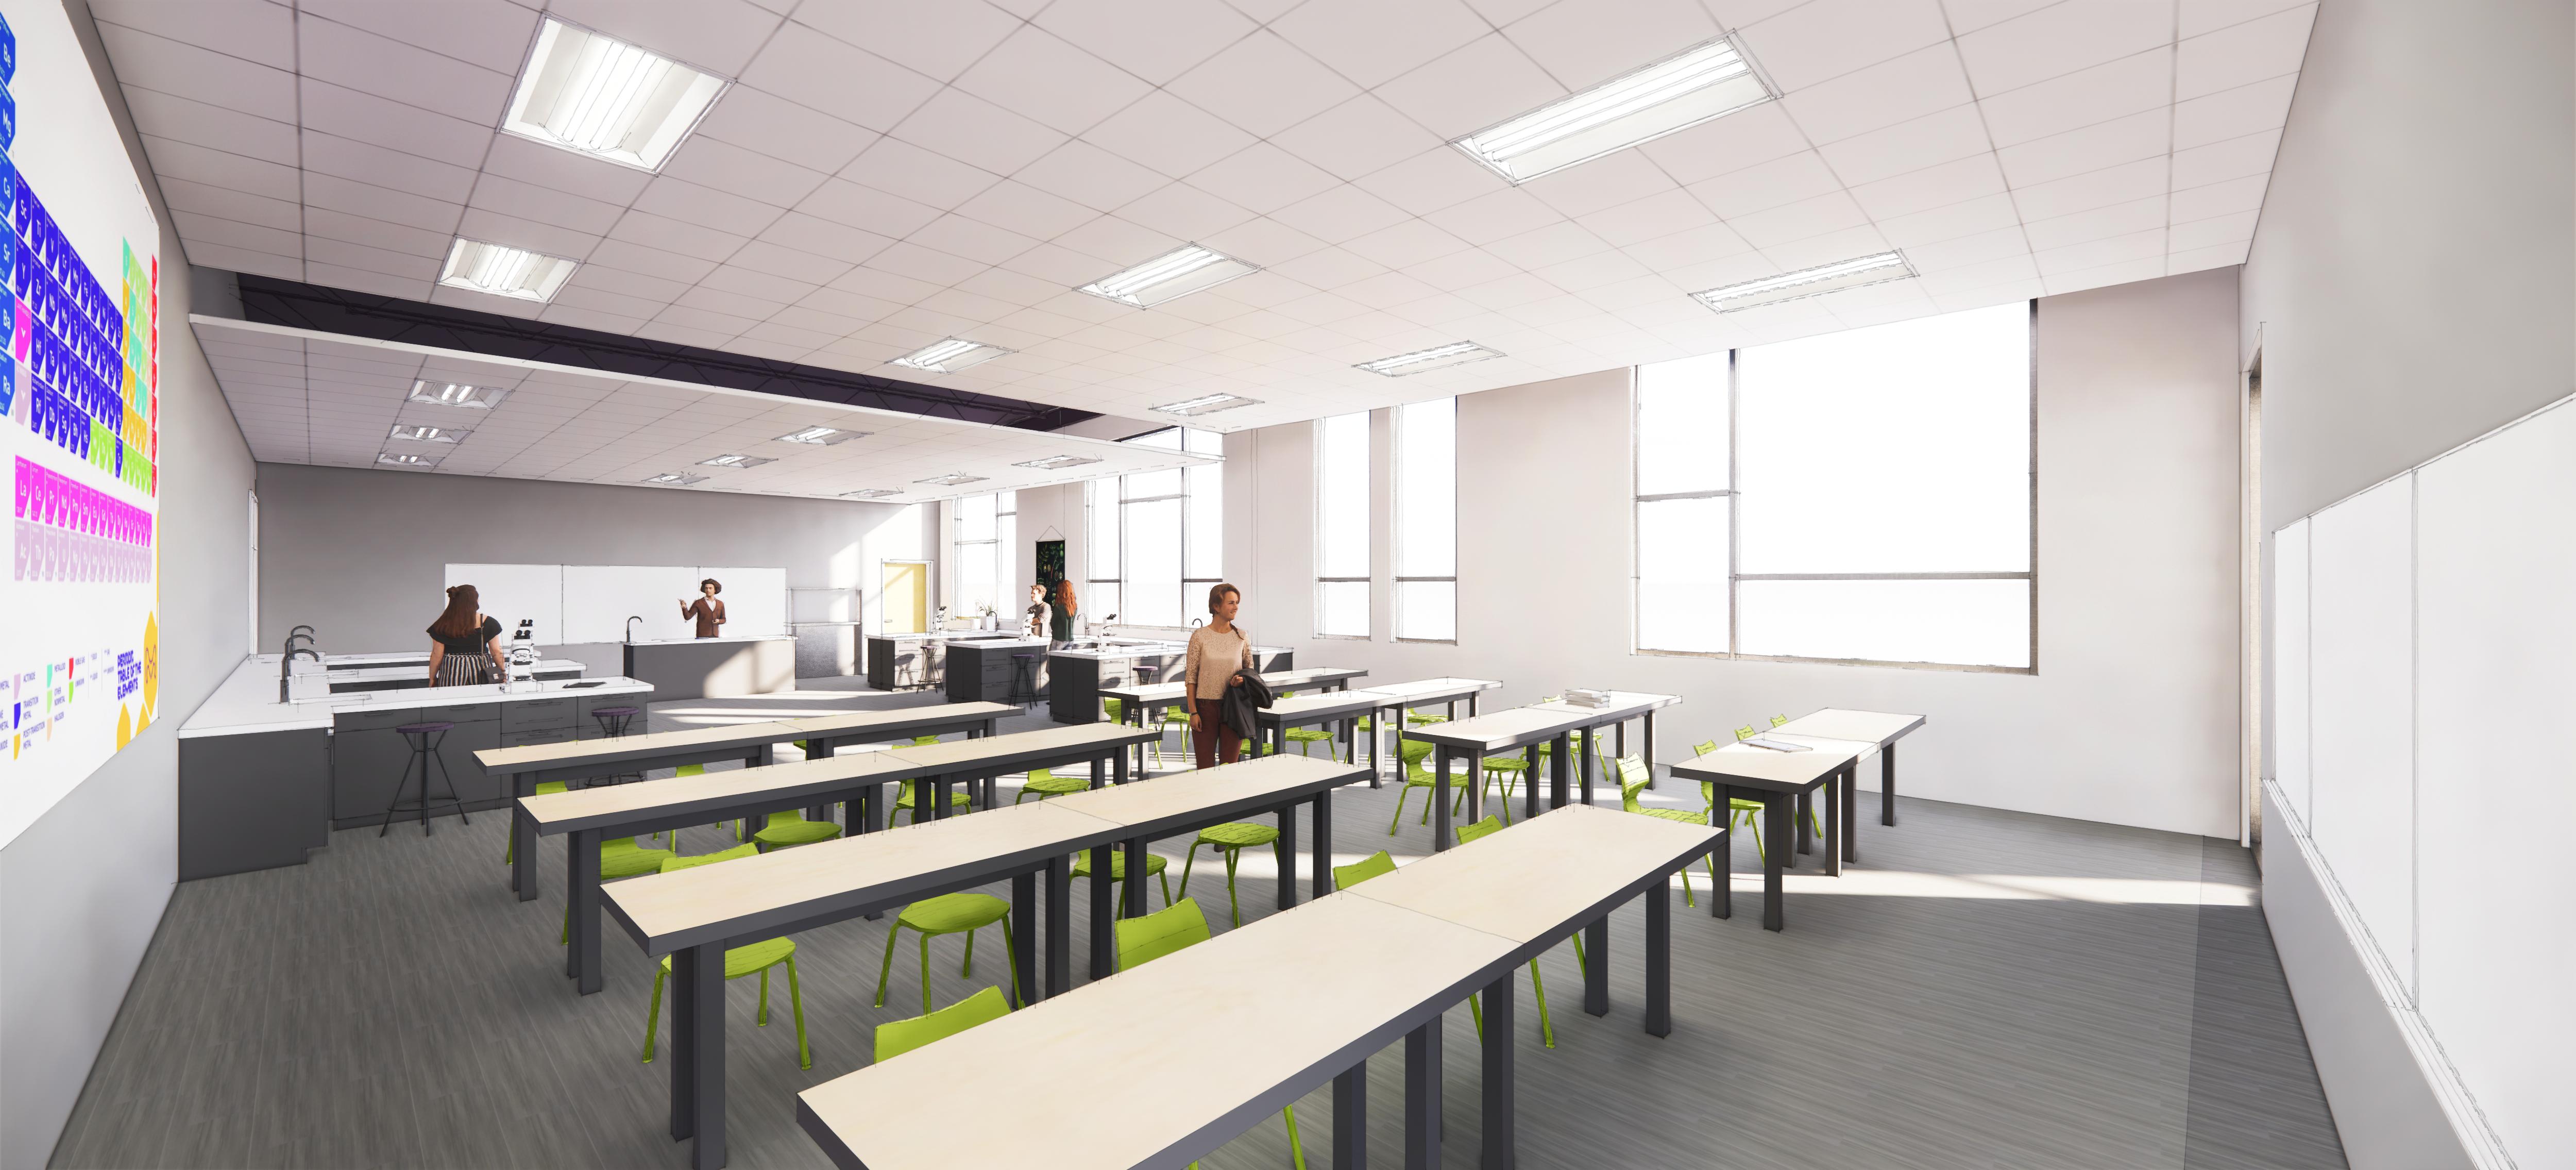 Science Classroom & Lab